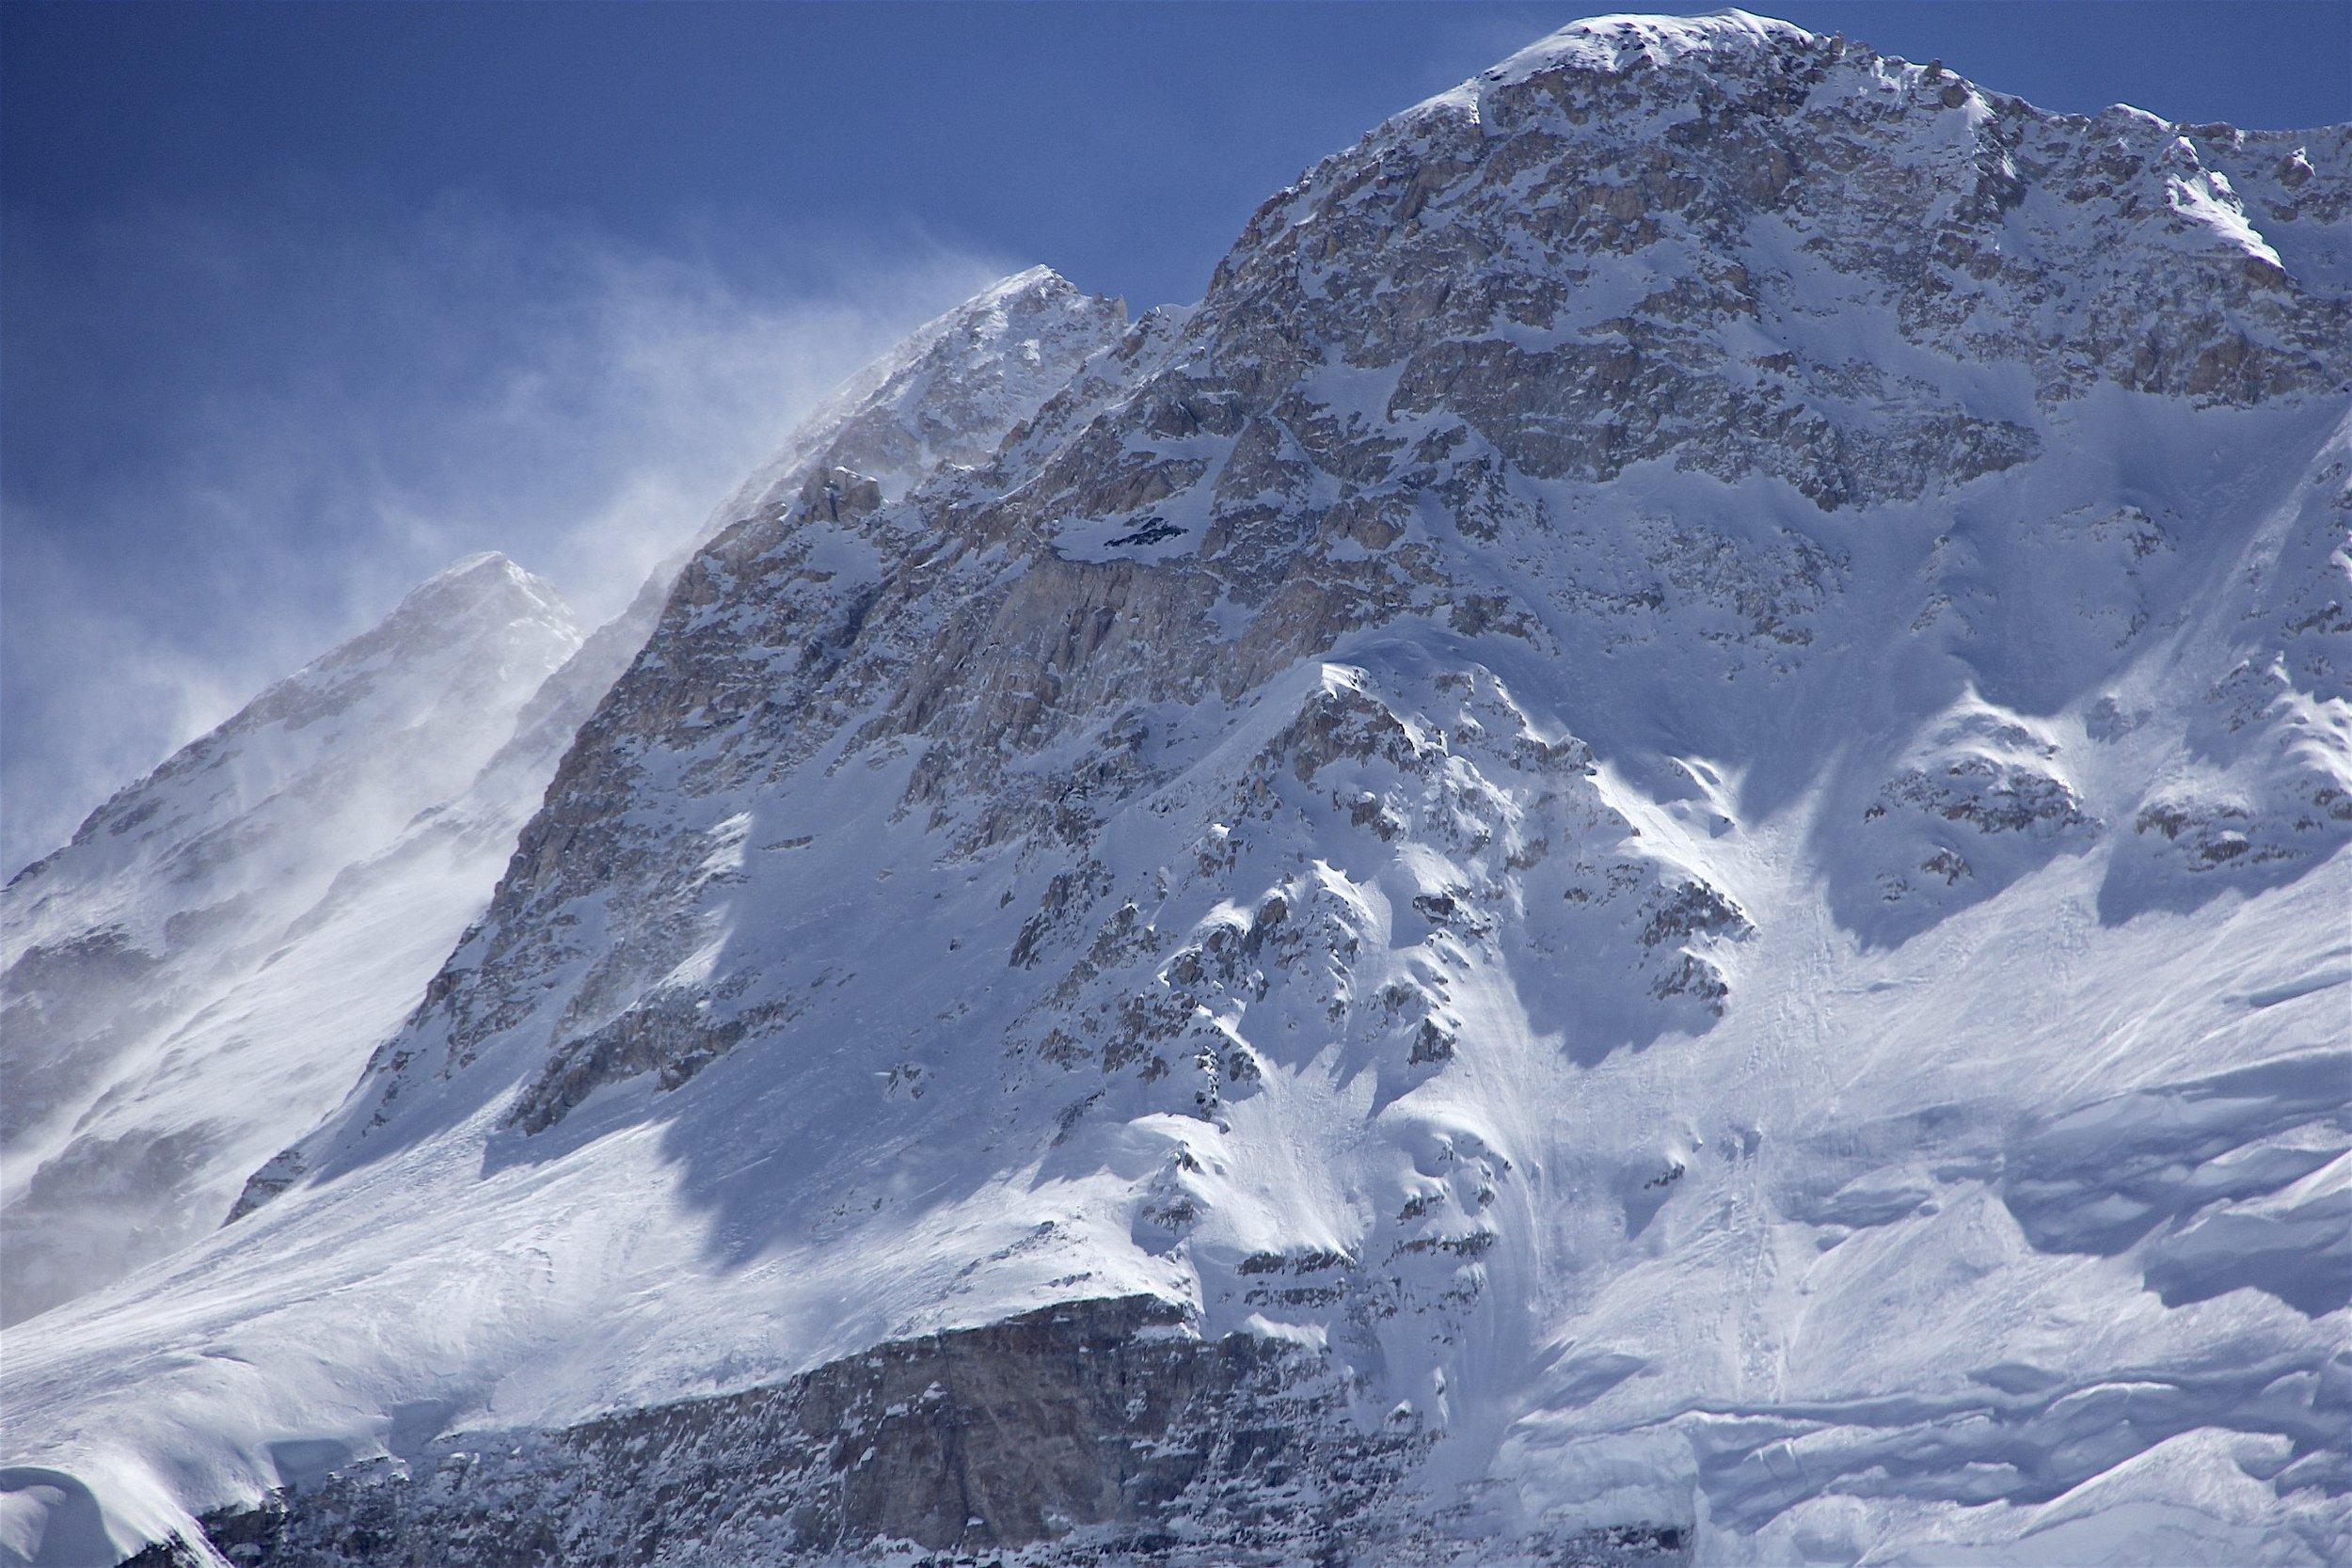 Kangbachen 7,802 and Kanchendzonga North Face as seen above Ramdang Glacier